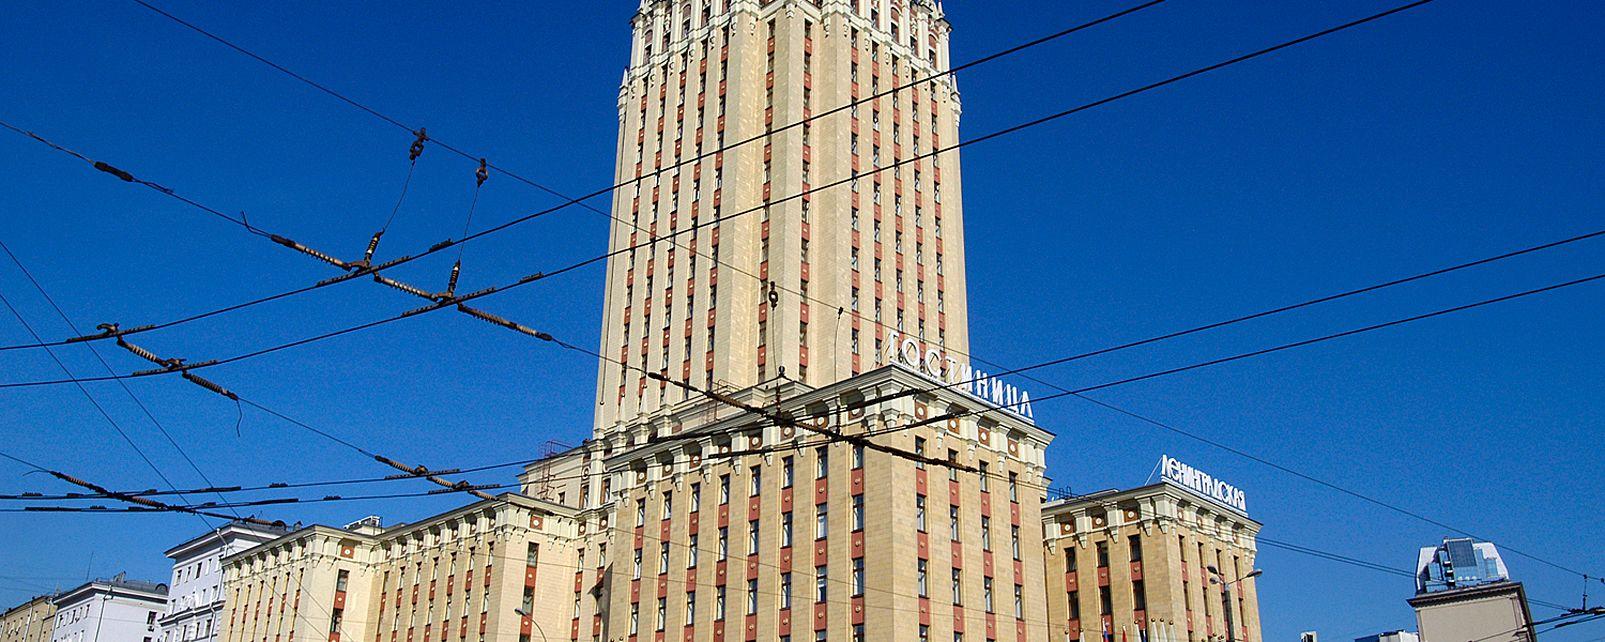 Hôtel Hilton Leningradskaya